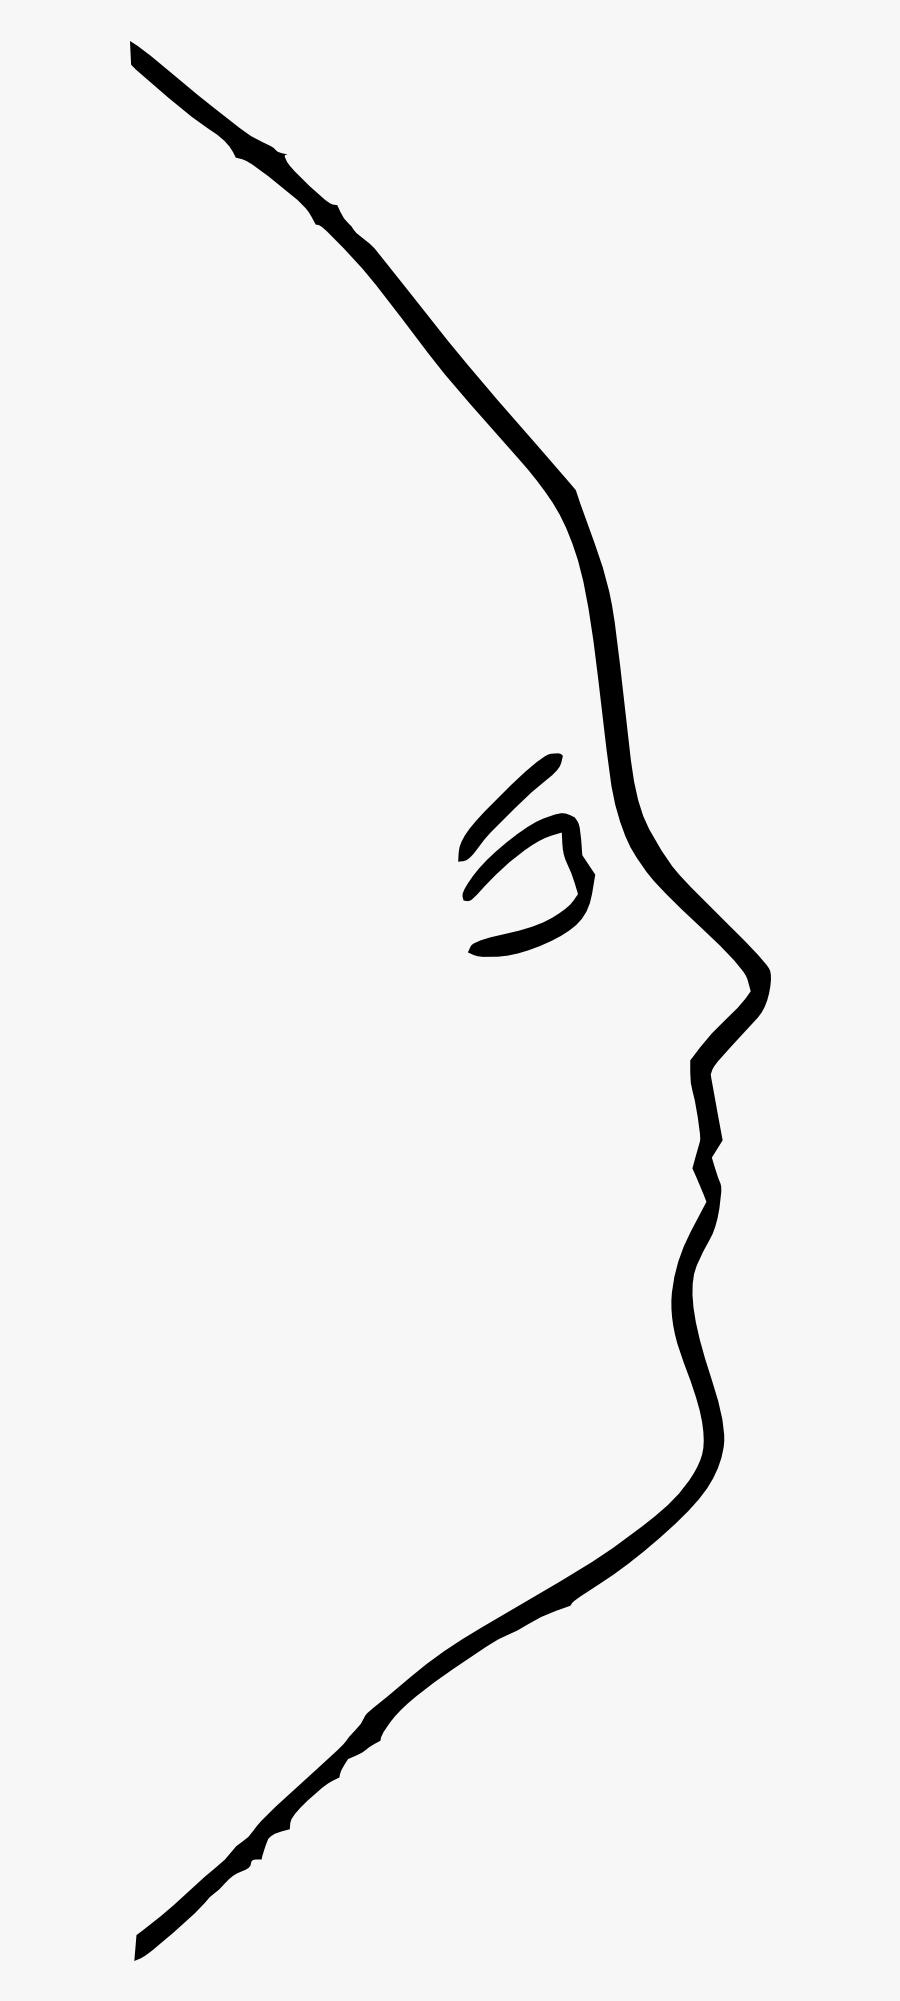 Transparent Ugly Woman Clipart - Human Face, Transparent Clipart